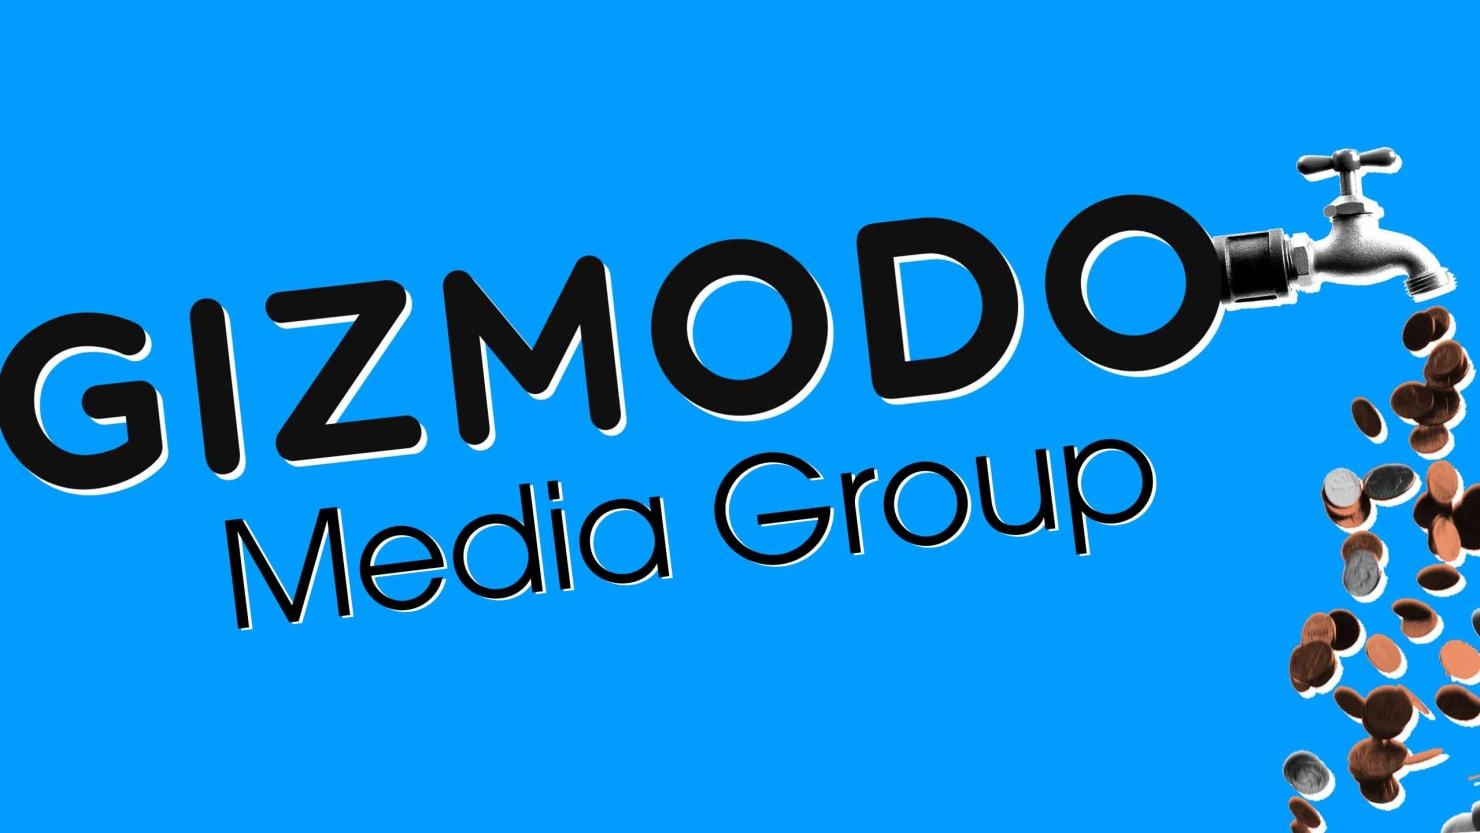 gizmodo media s turmoil continues 40 staffers take buyouts